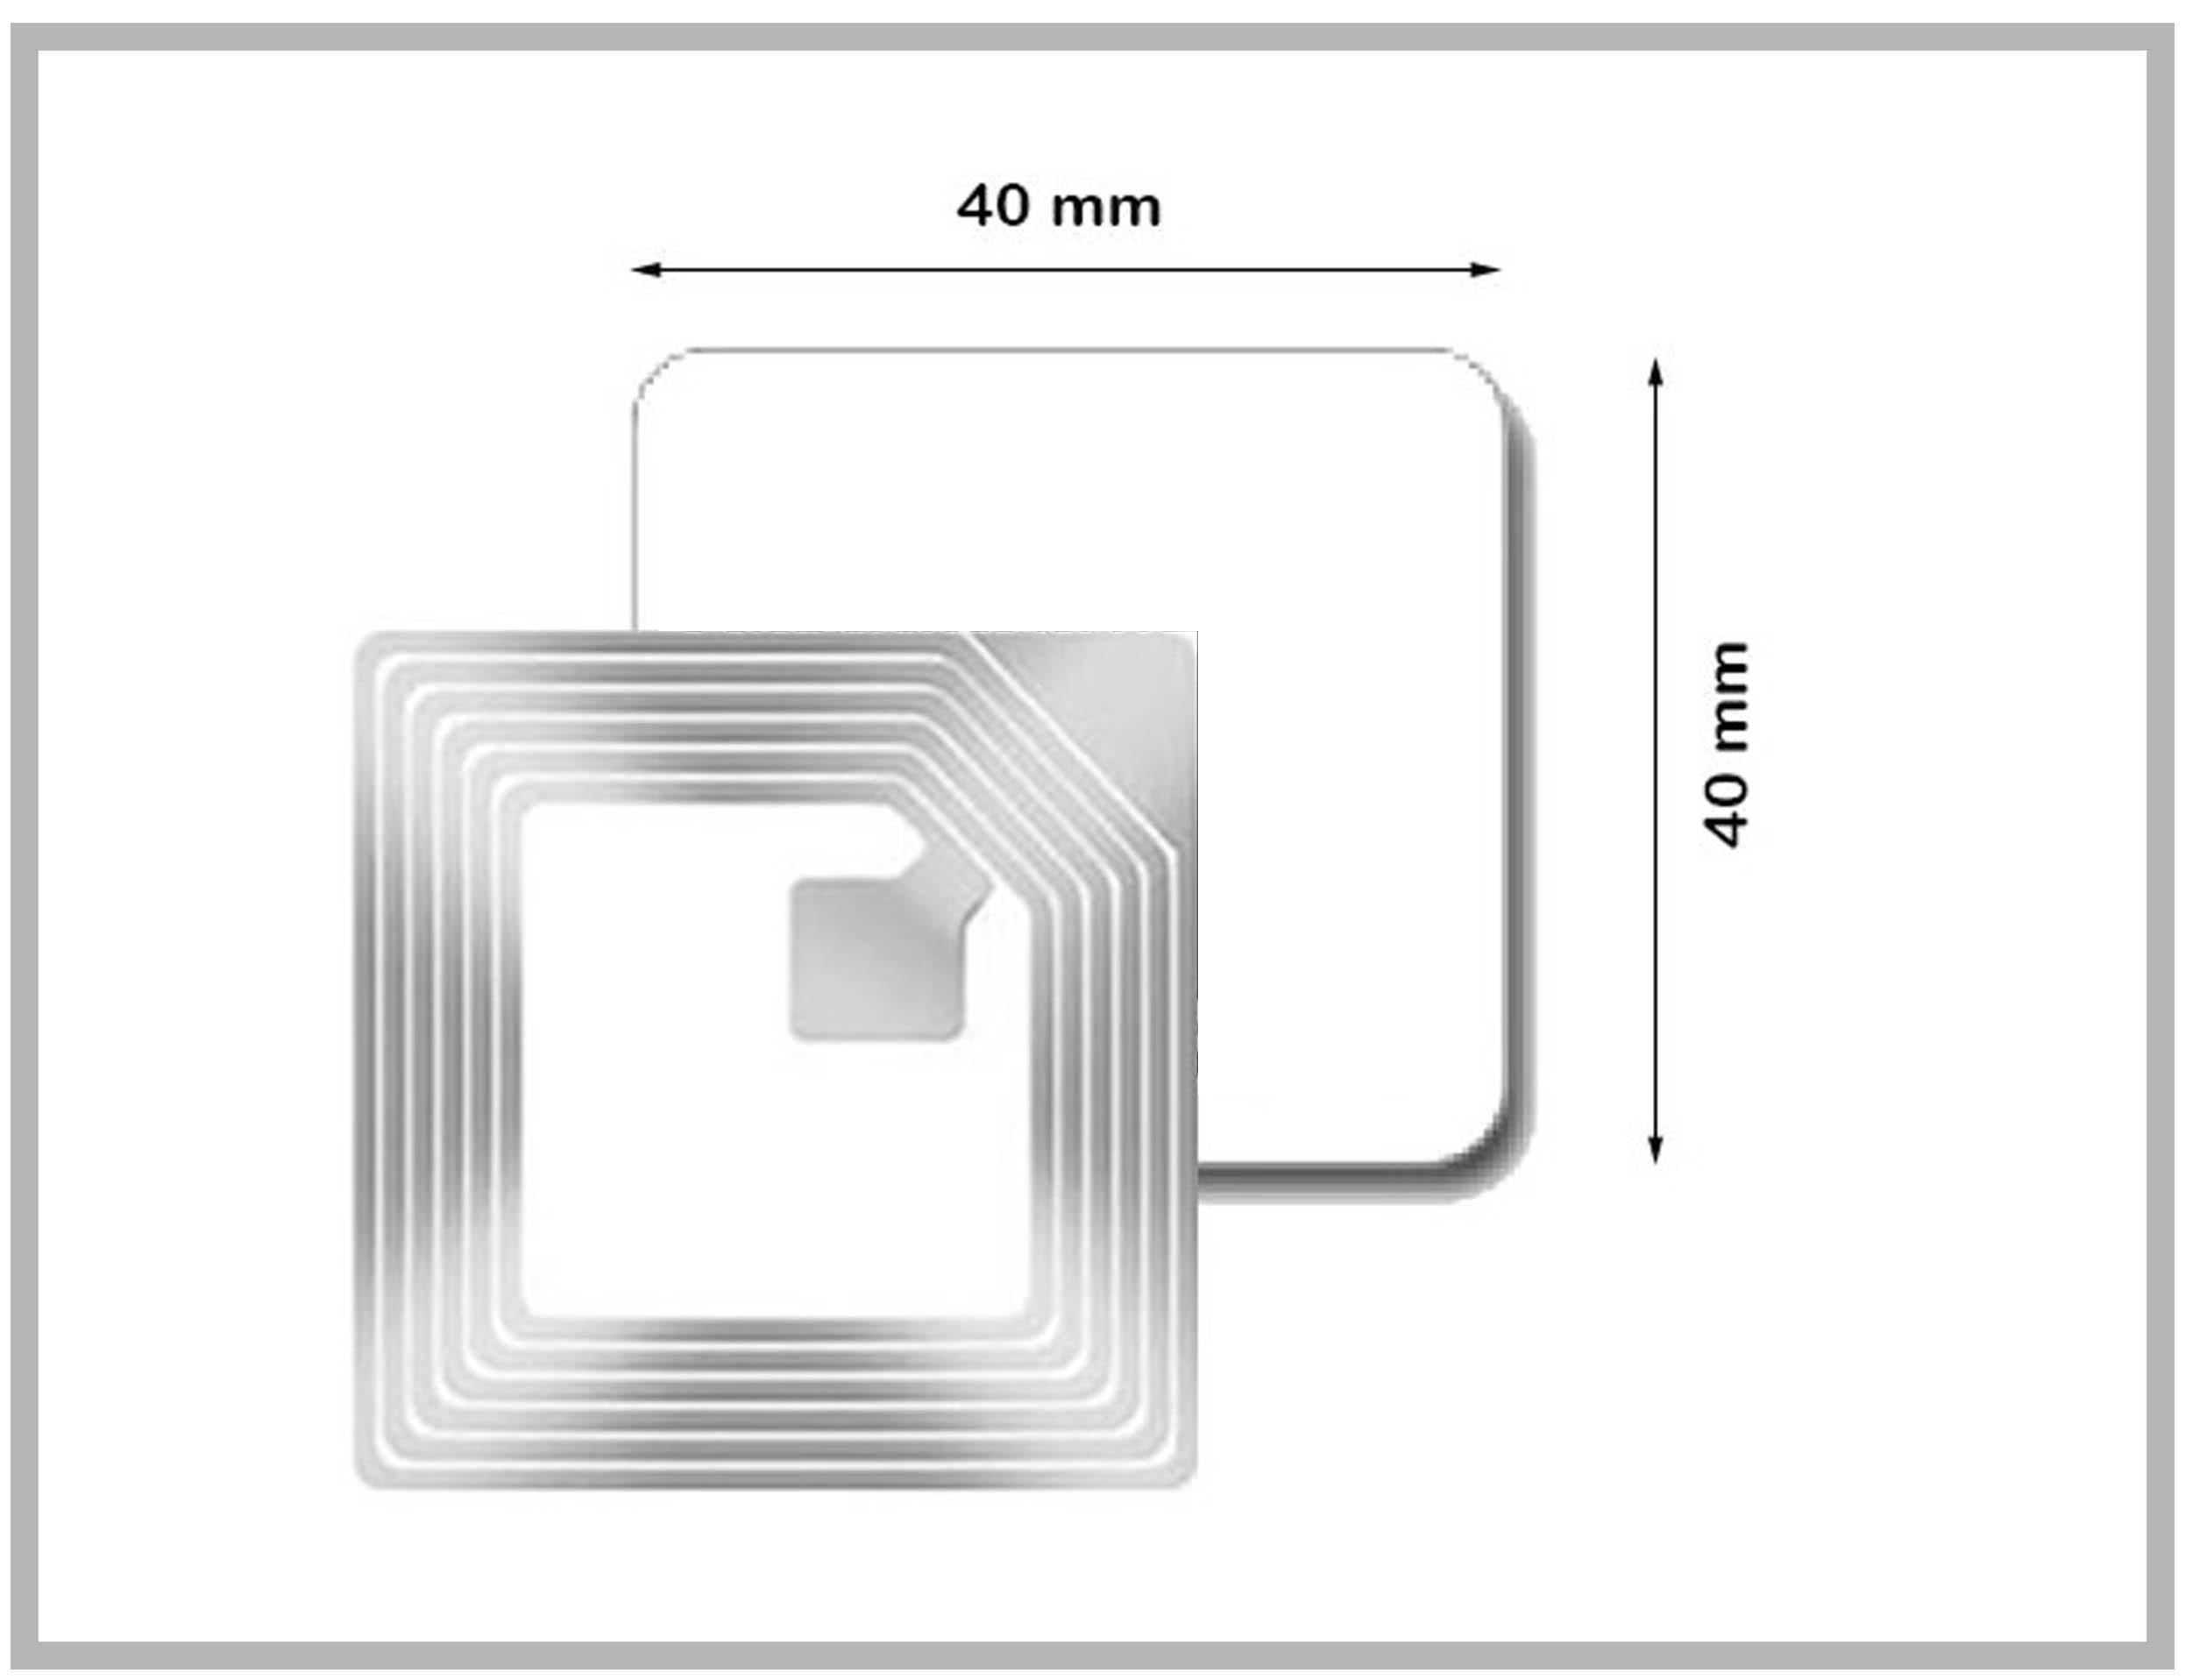 RF Label 40x40mm sans code barre